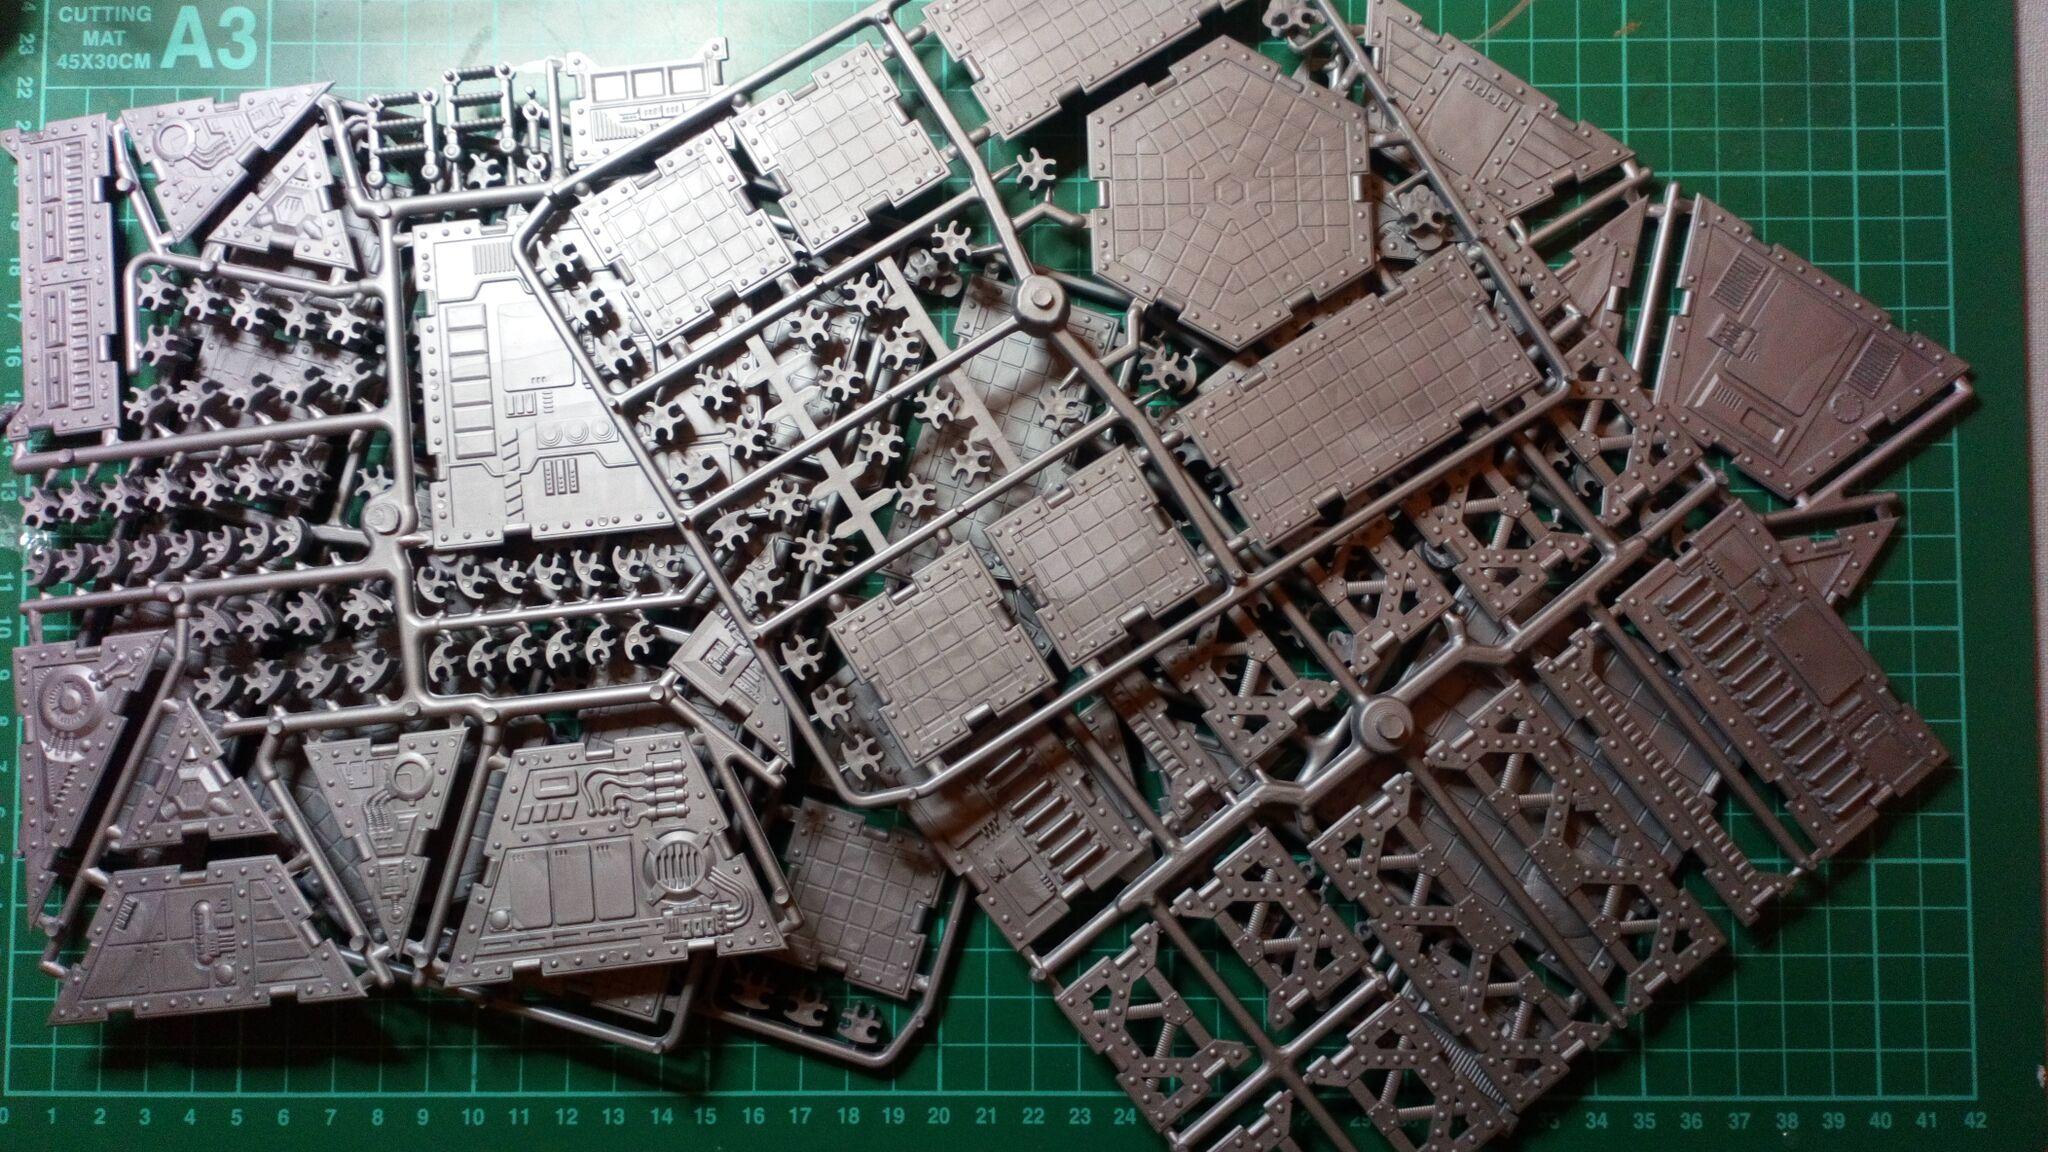 Robogear terrain